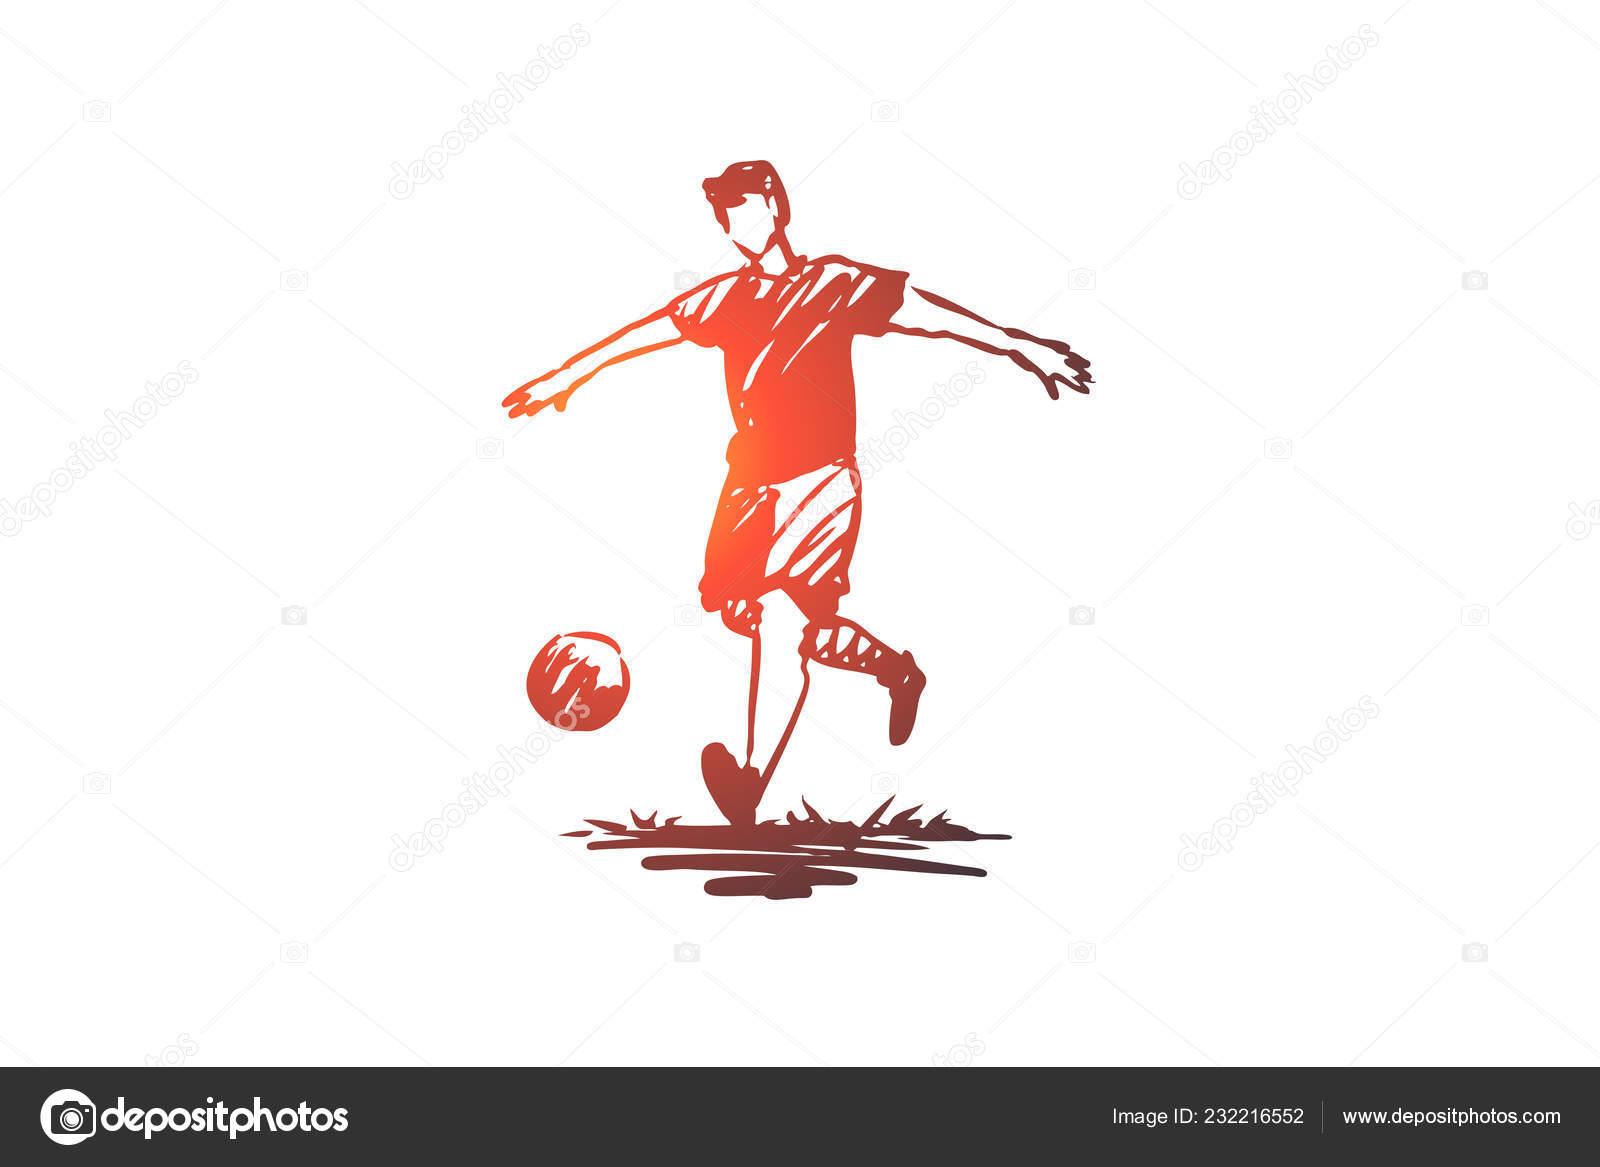 Fussball Spieler Fussball Spiel Handlungskonzept Hand